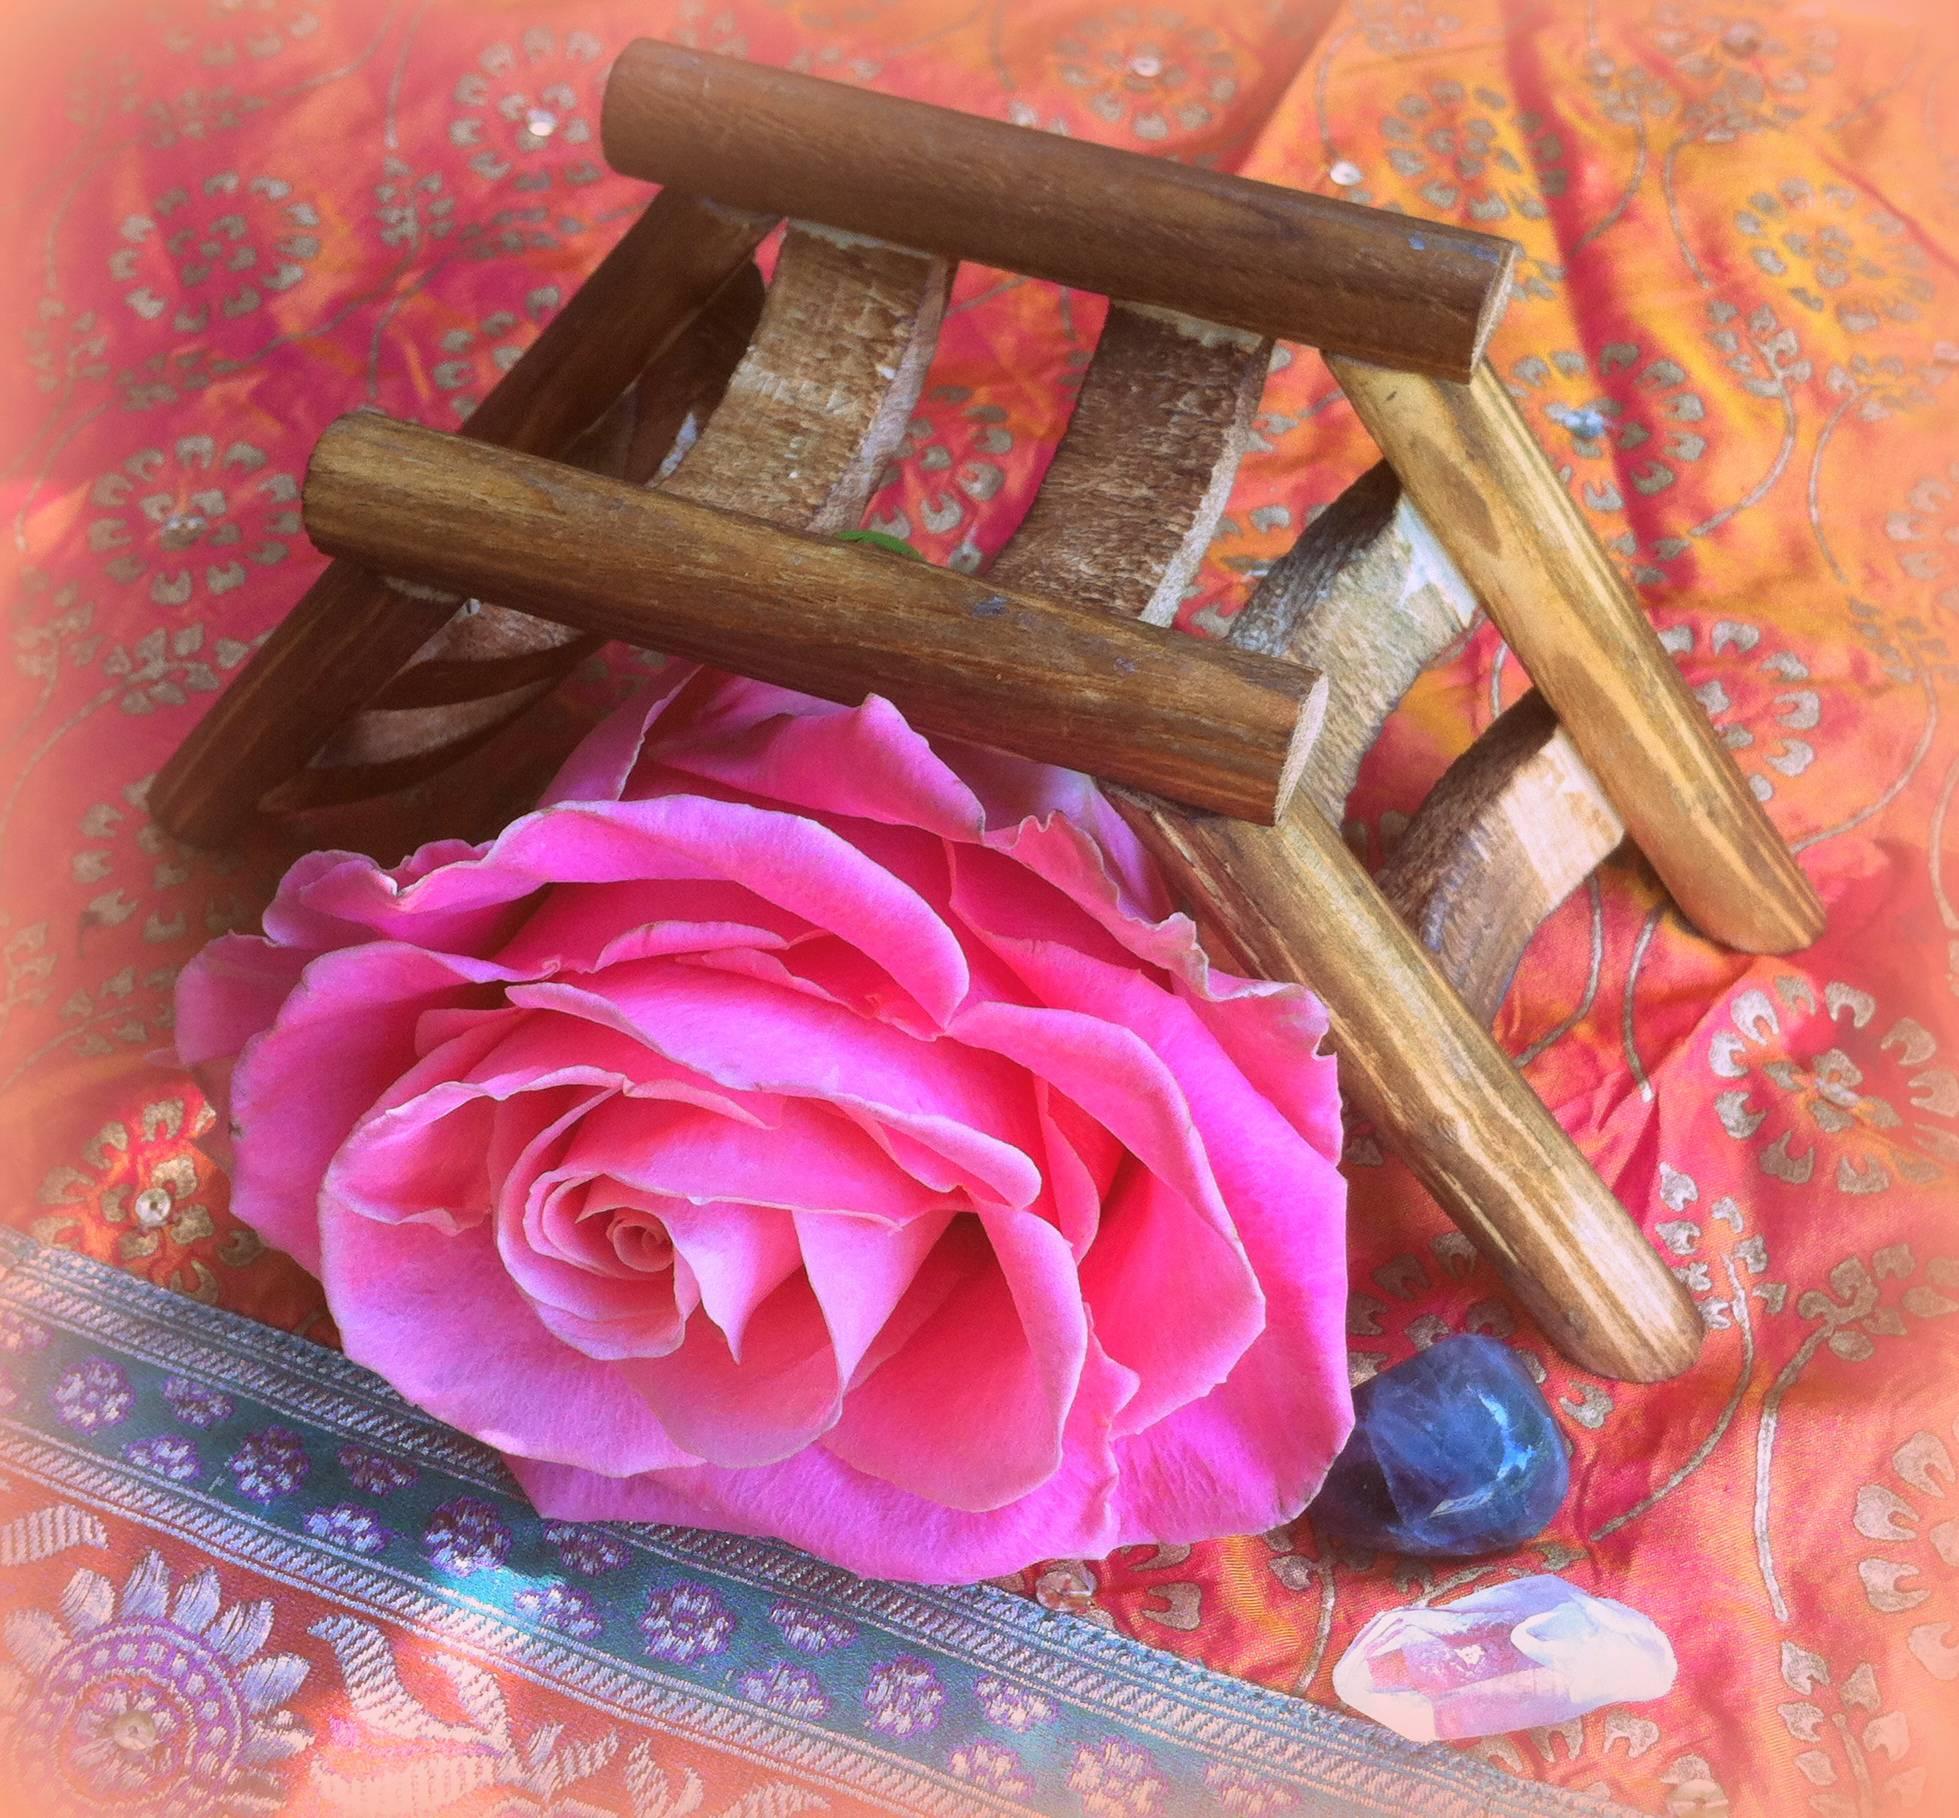 Simple Ritual 4: Summer Solstice Bridging